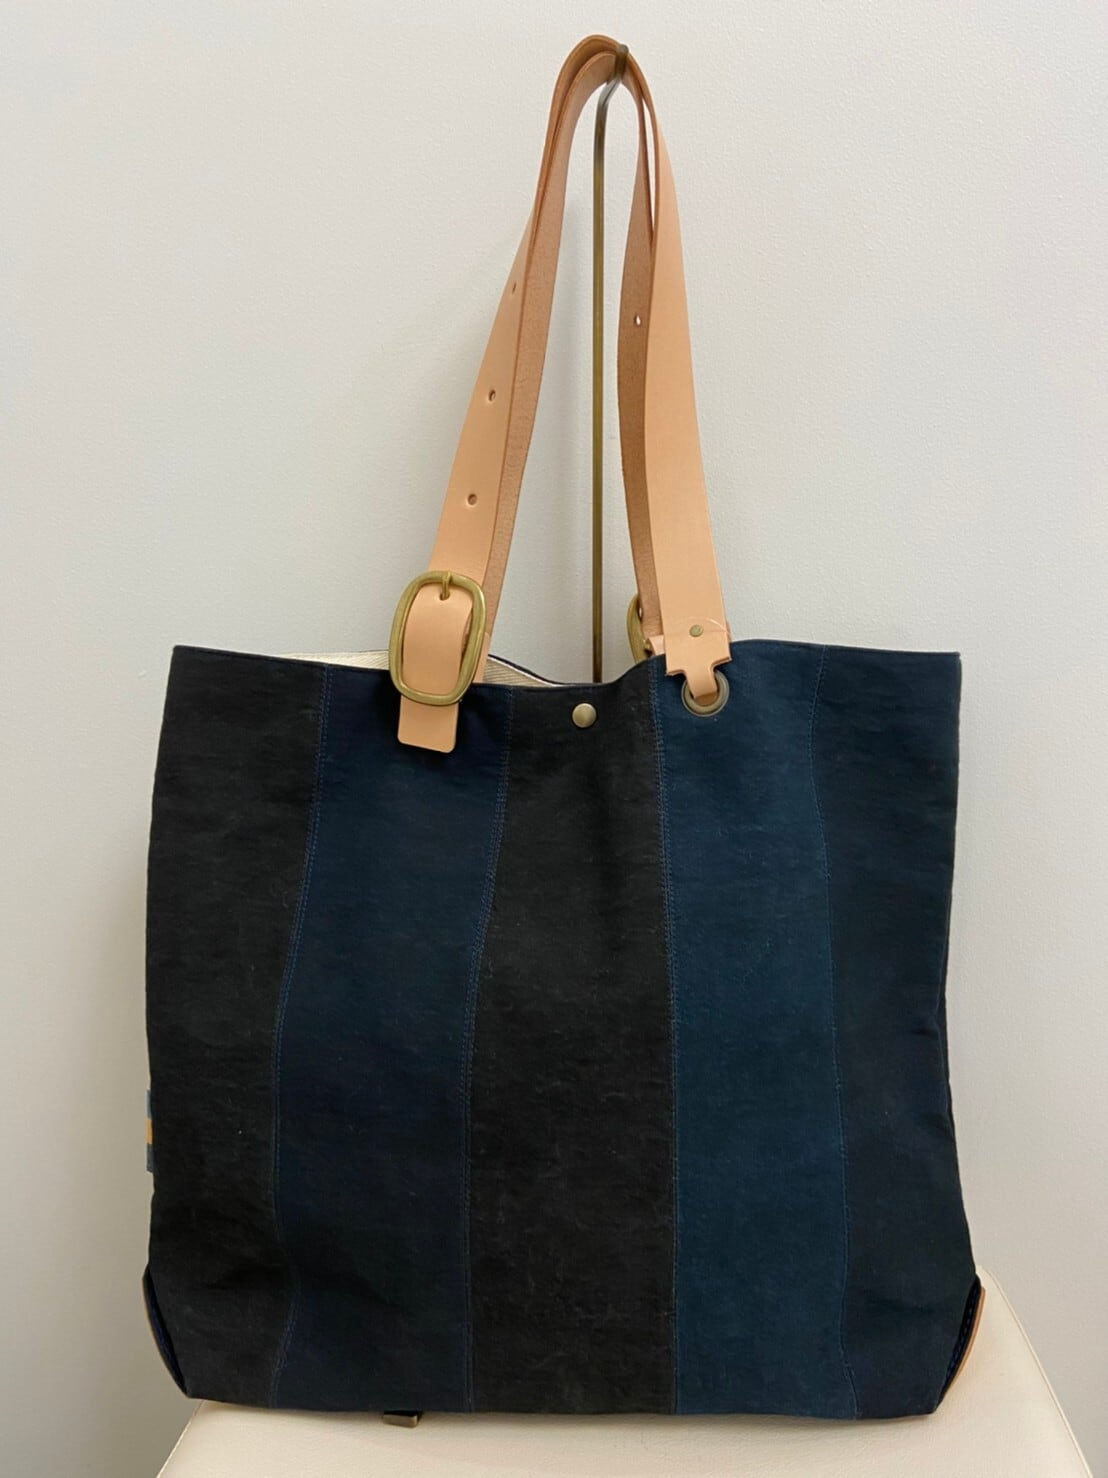 【shimaai】黒帆布クリエイターズトート